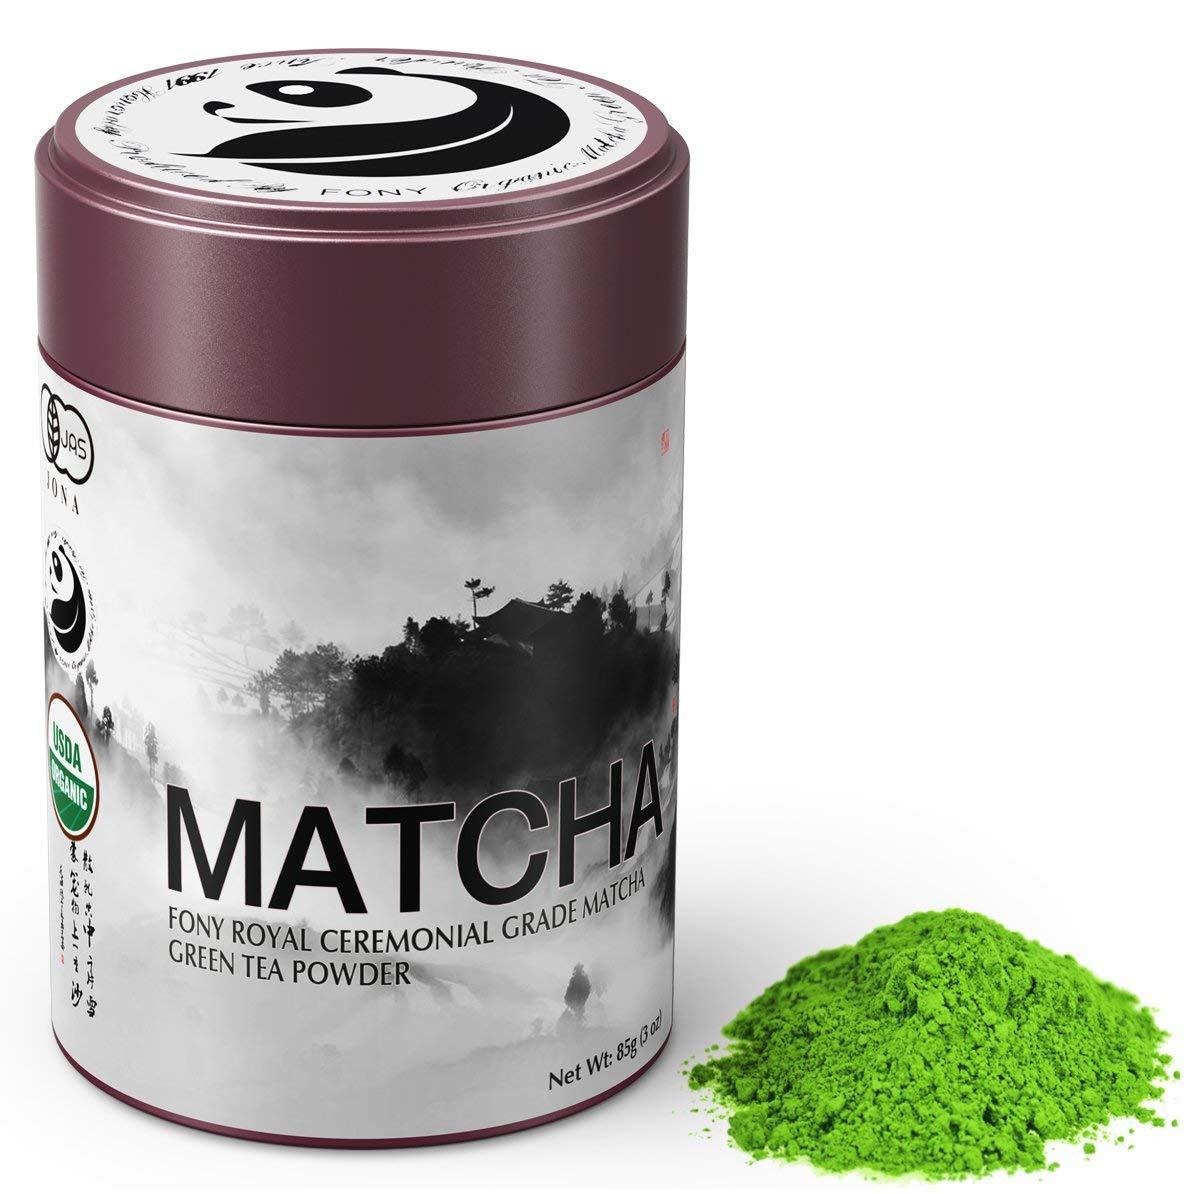 FONY 85g Japanese Matcha Green Tea Powder, USDA Organic - Authentic Ceremonial Grade (Royal, Tin)